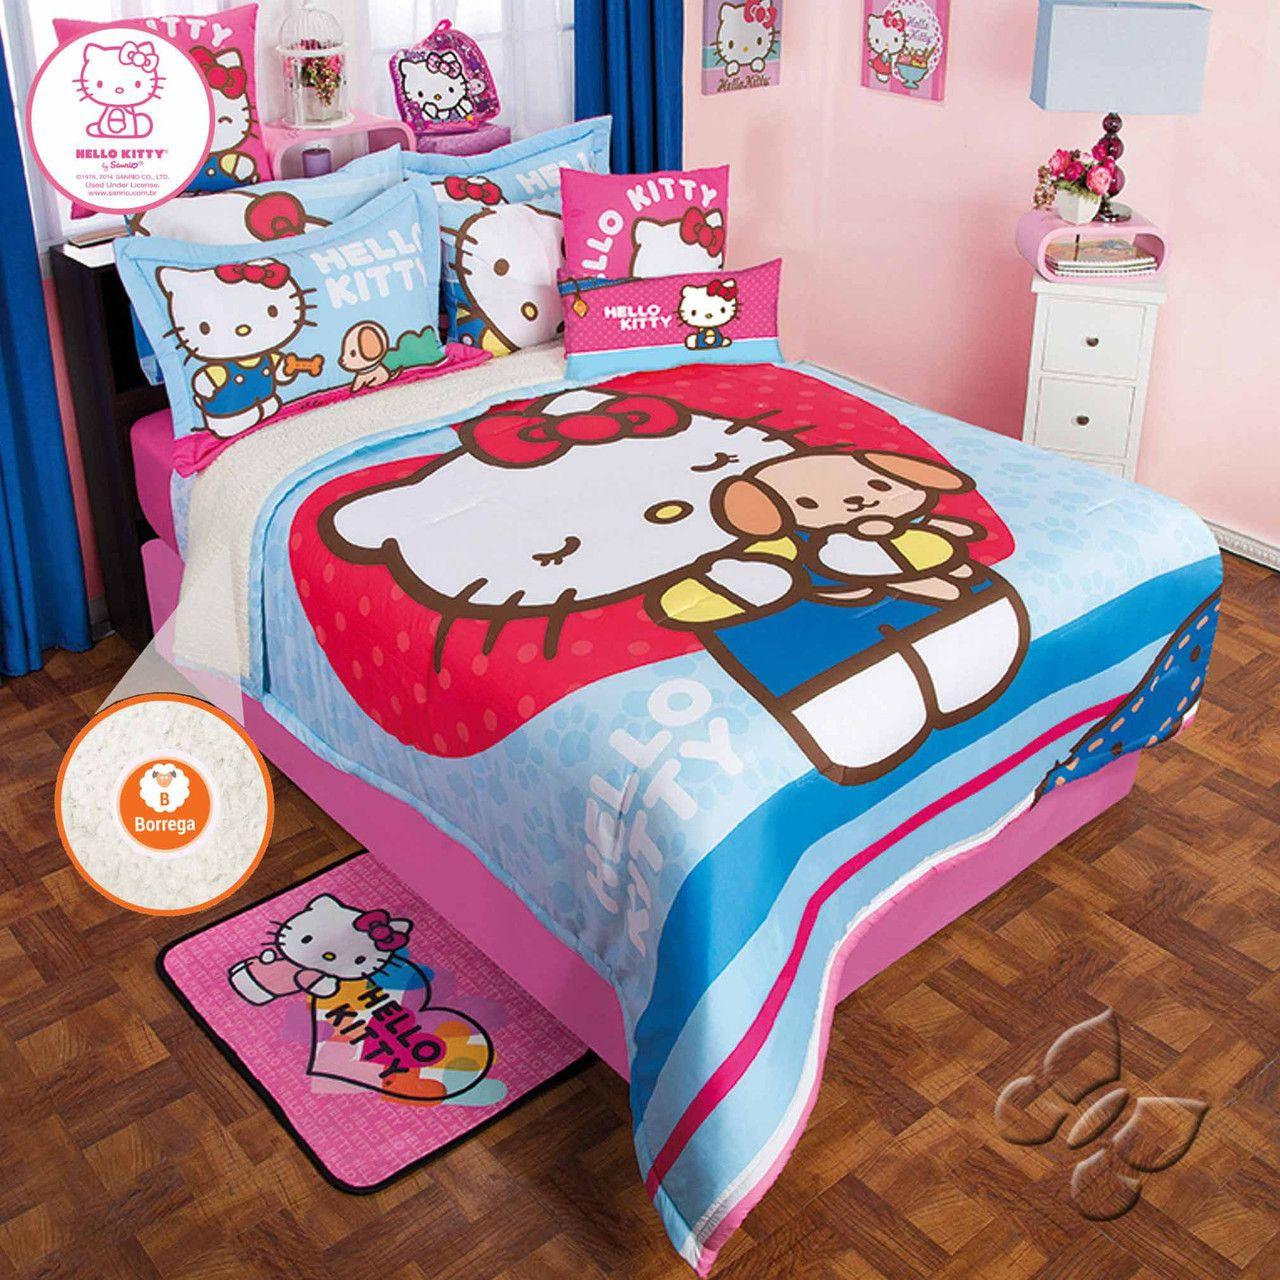 Hello Kitty Softy Comforter Set 189.85209.85 A Bit